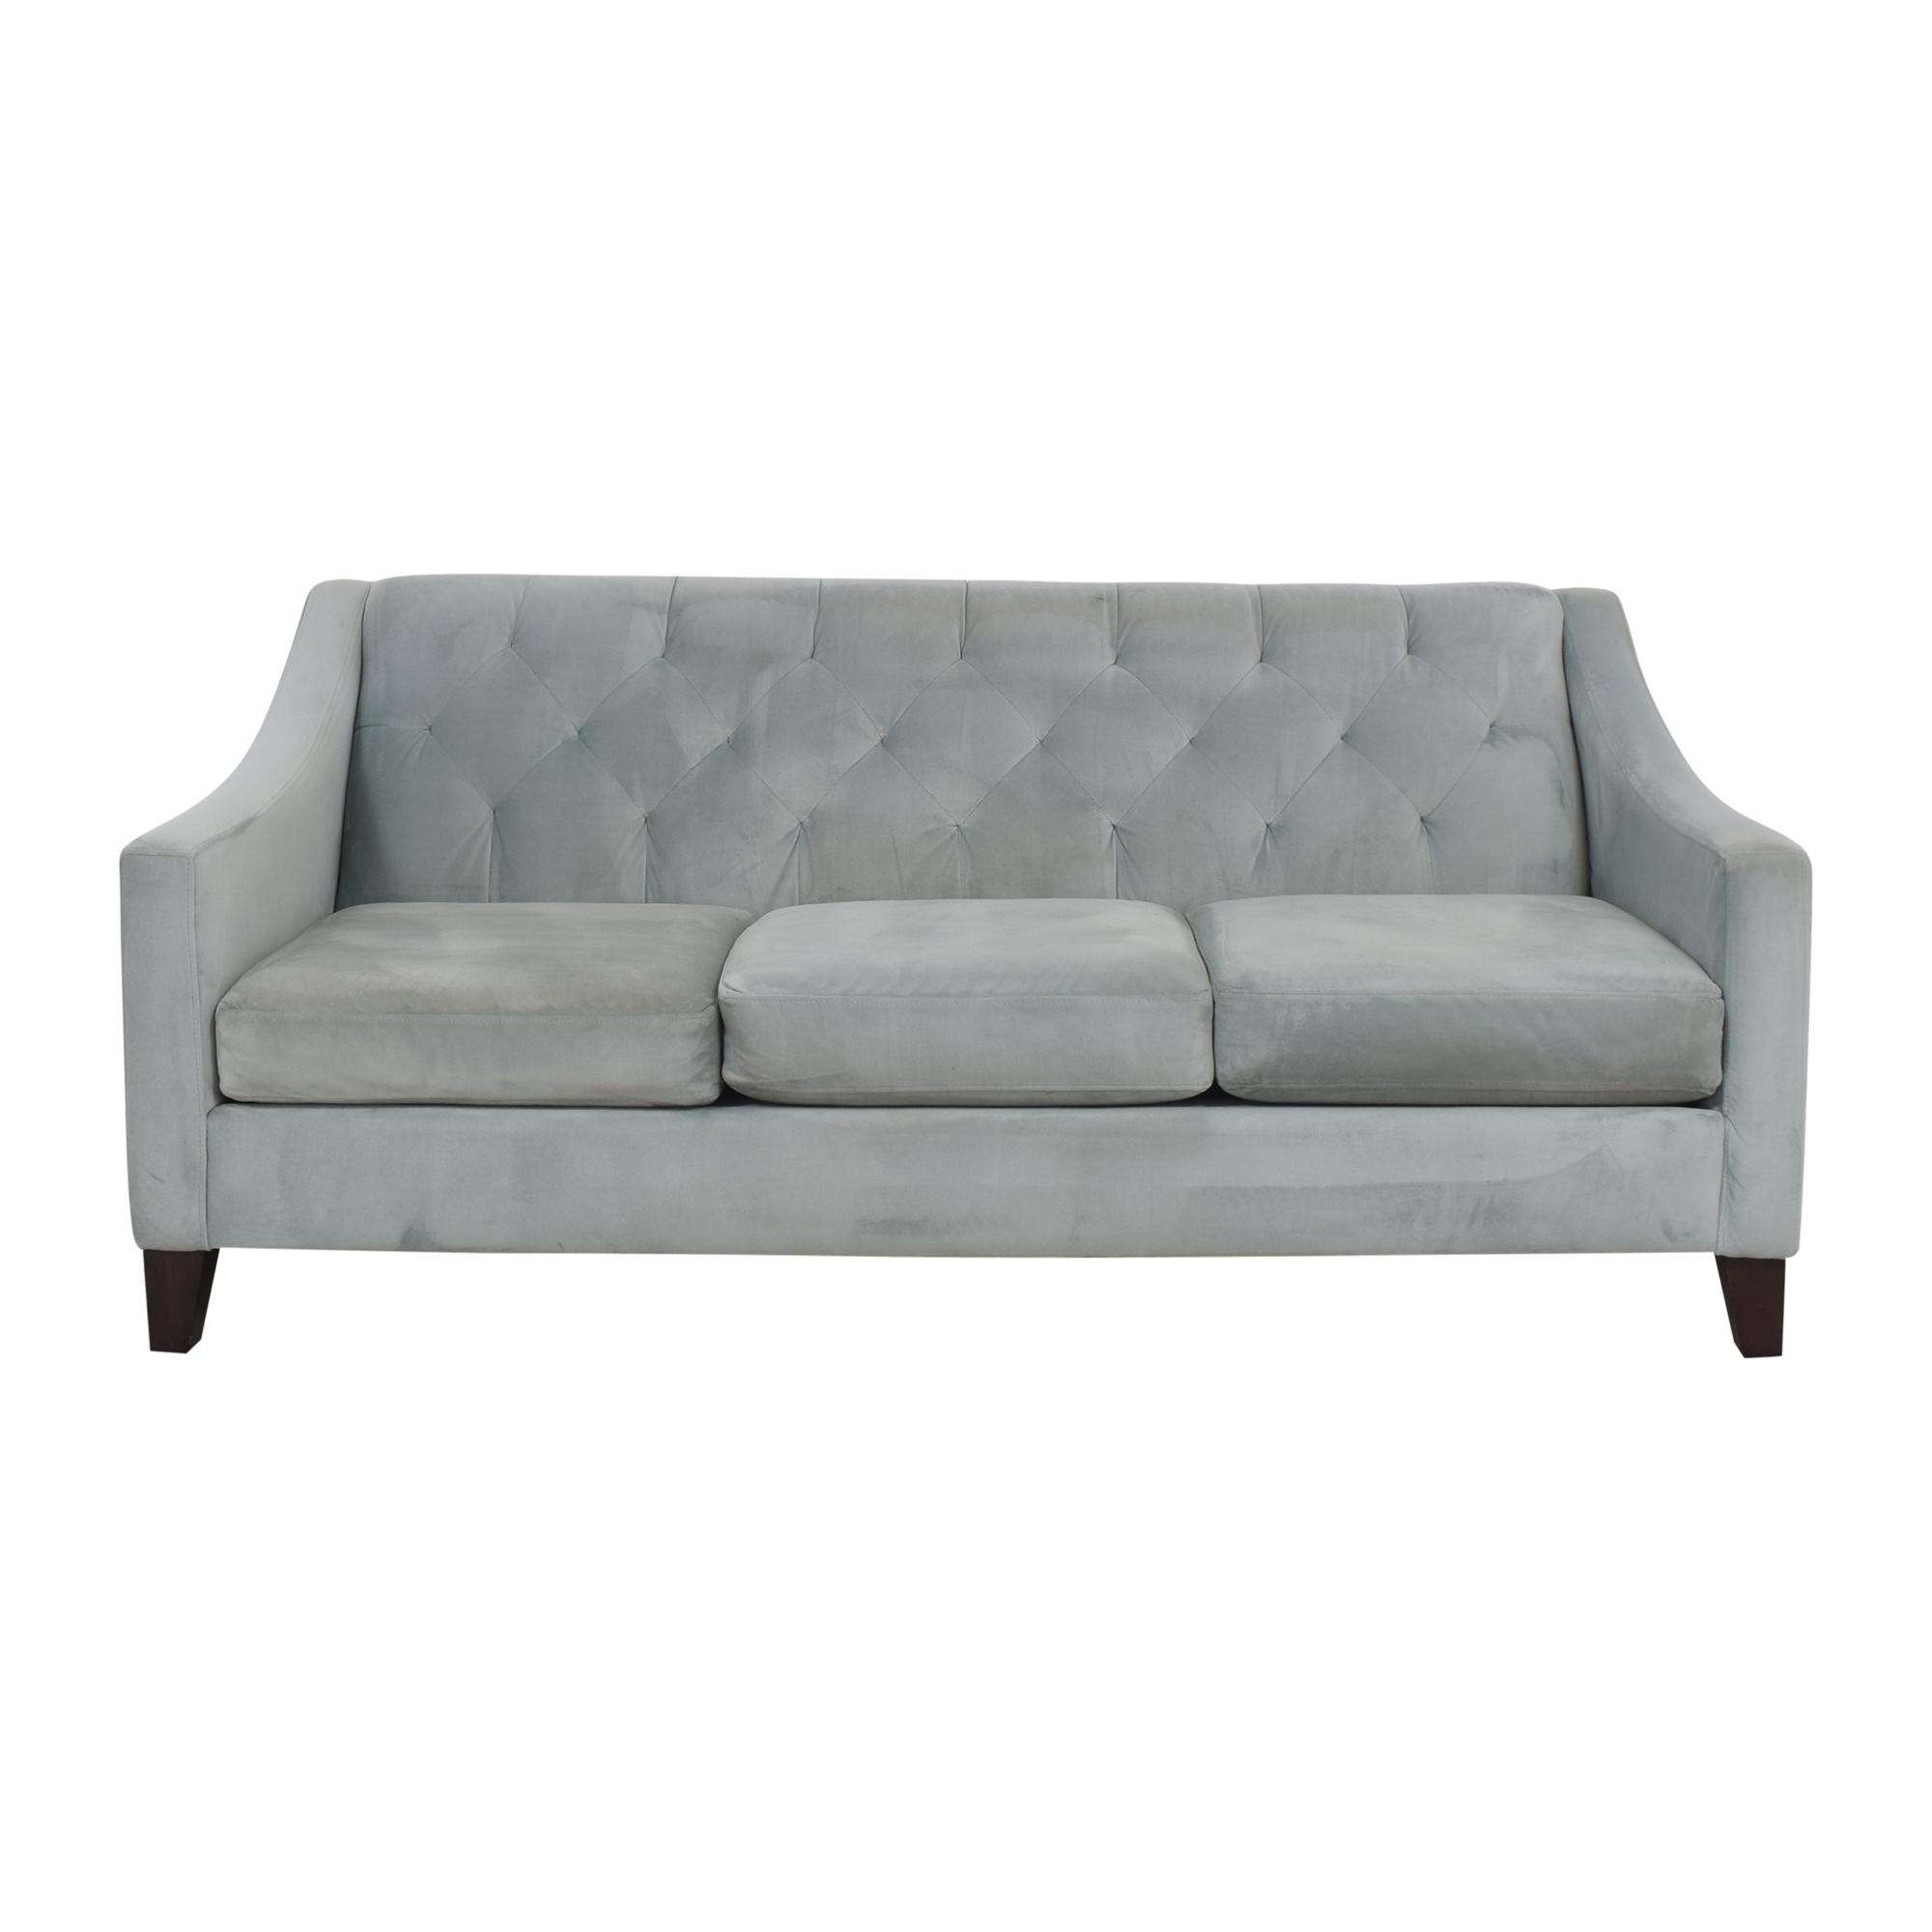 Macy's Macy's Chloe Tufted Sofa discount